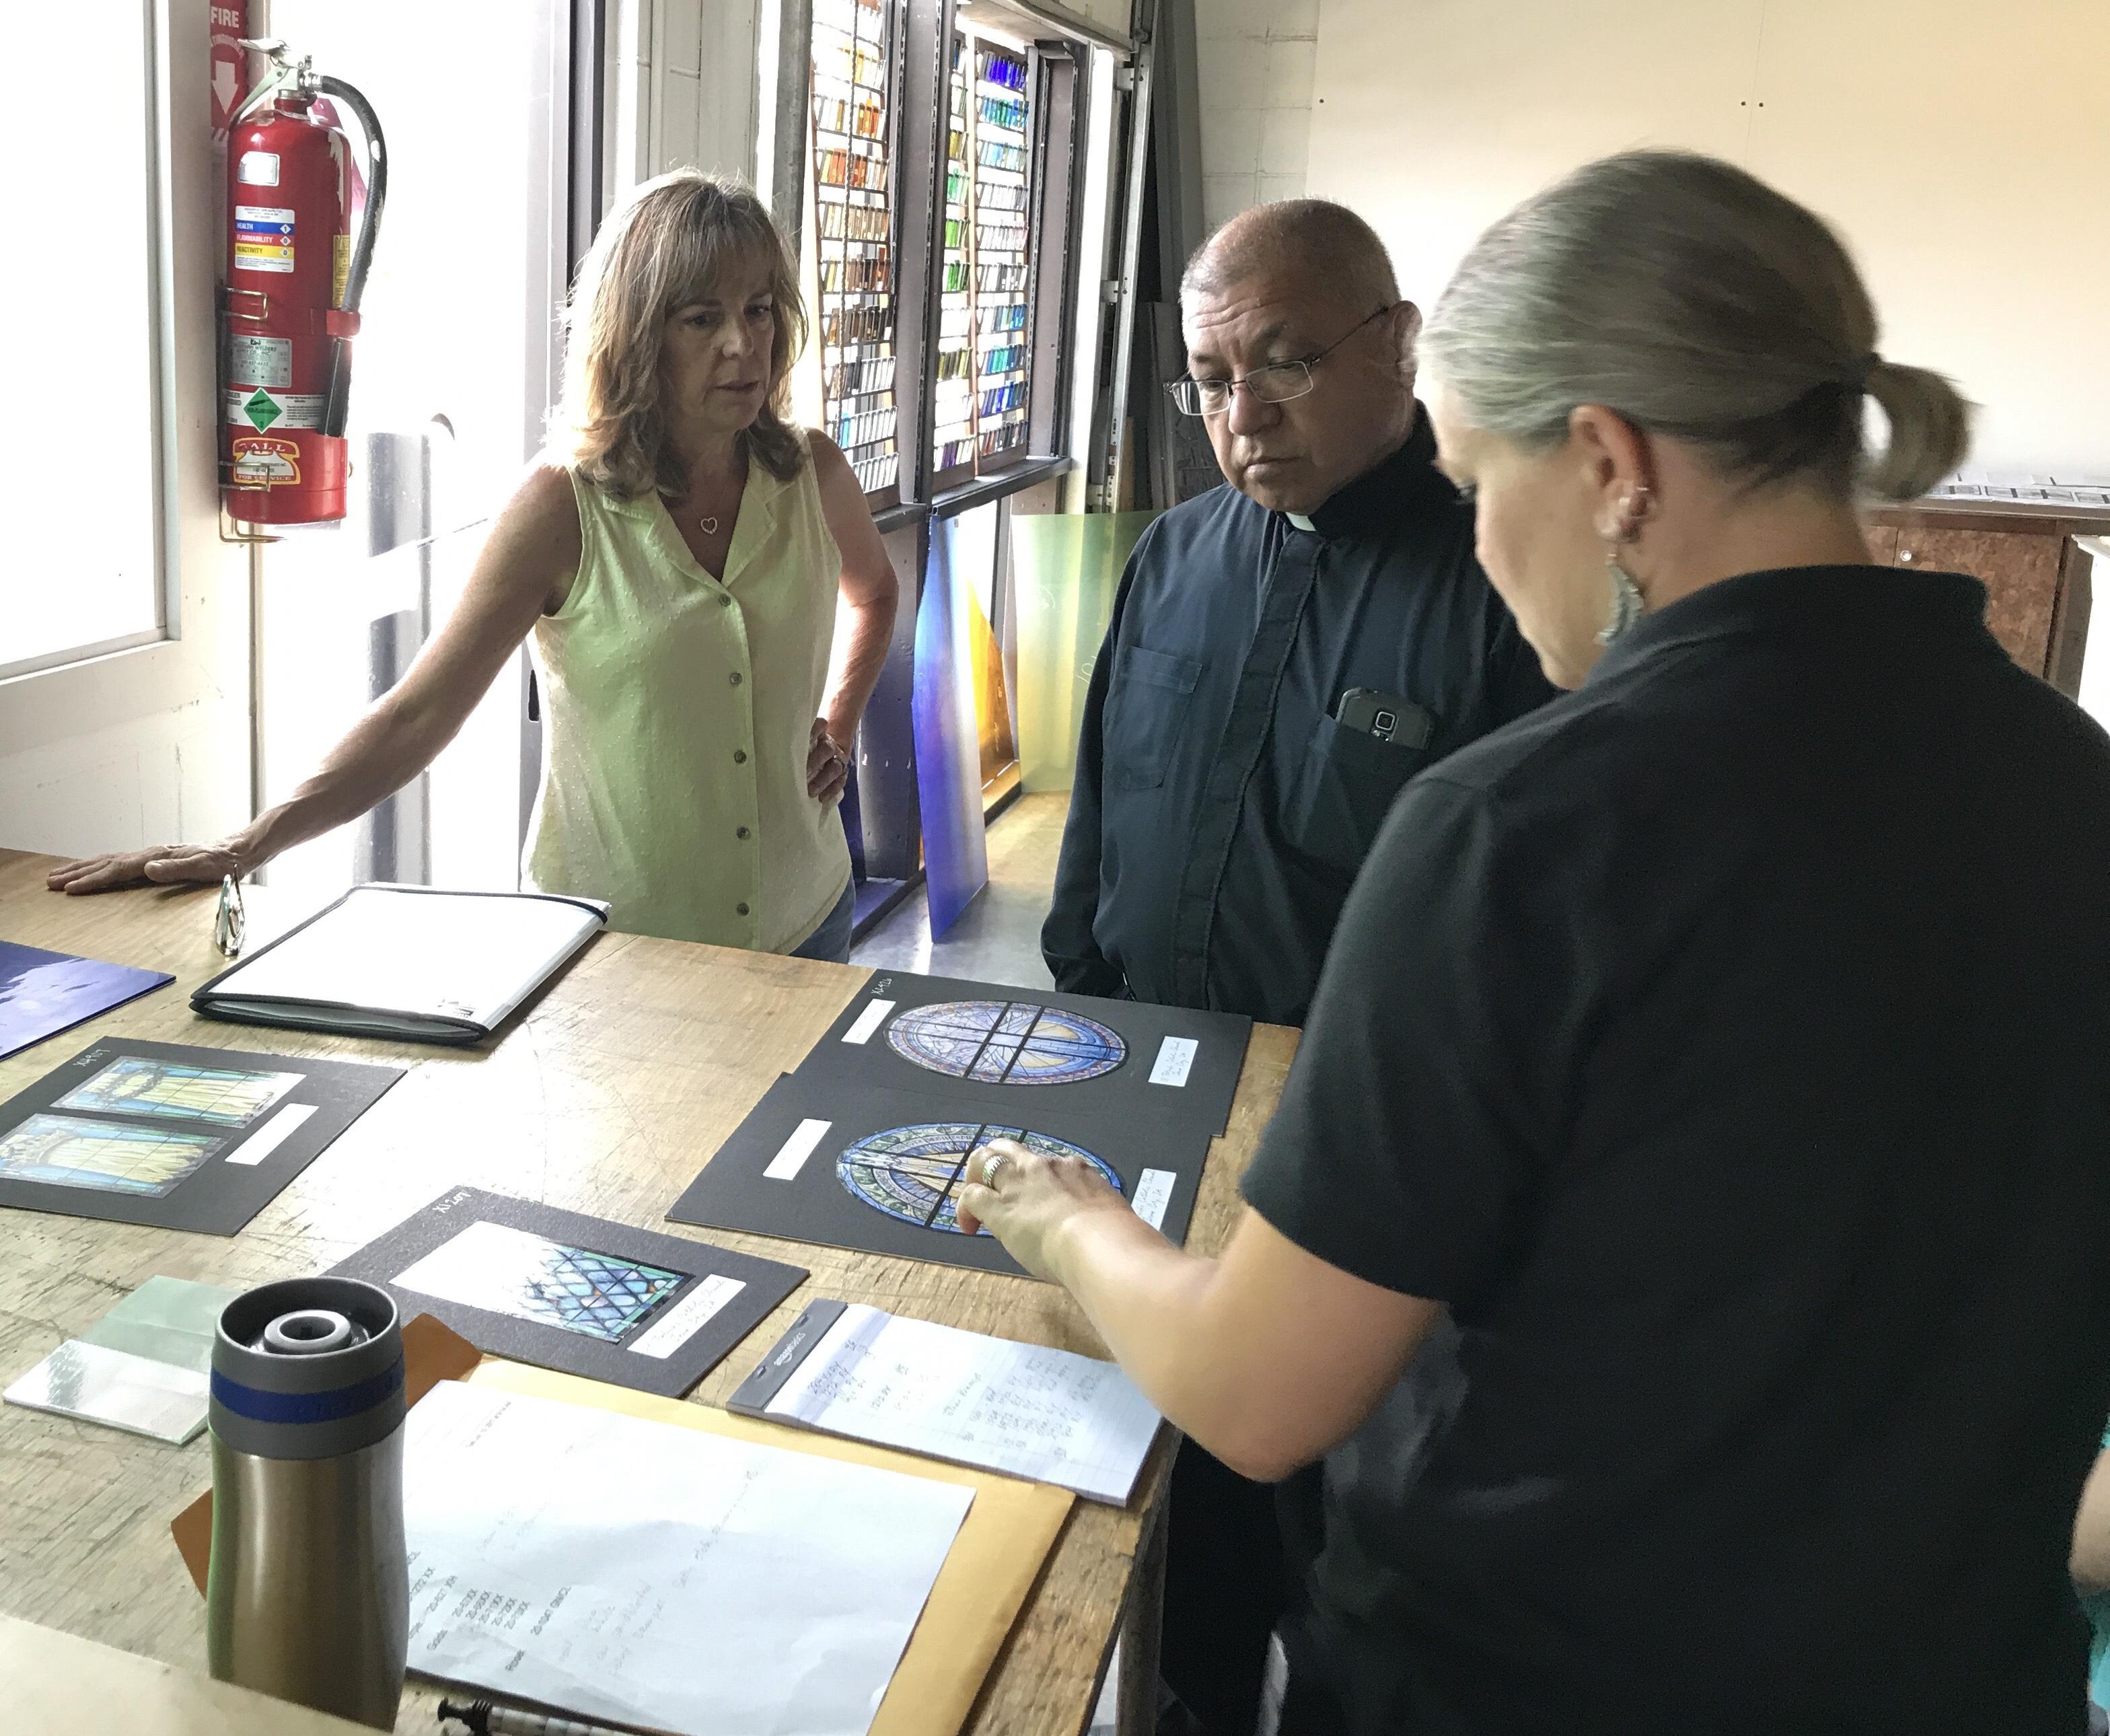 Kathy Jordan and Melissa Janda giving a color review